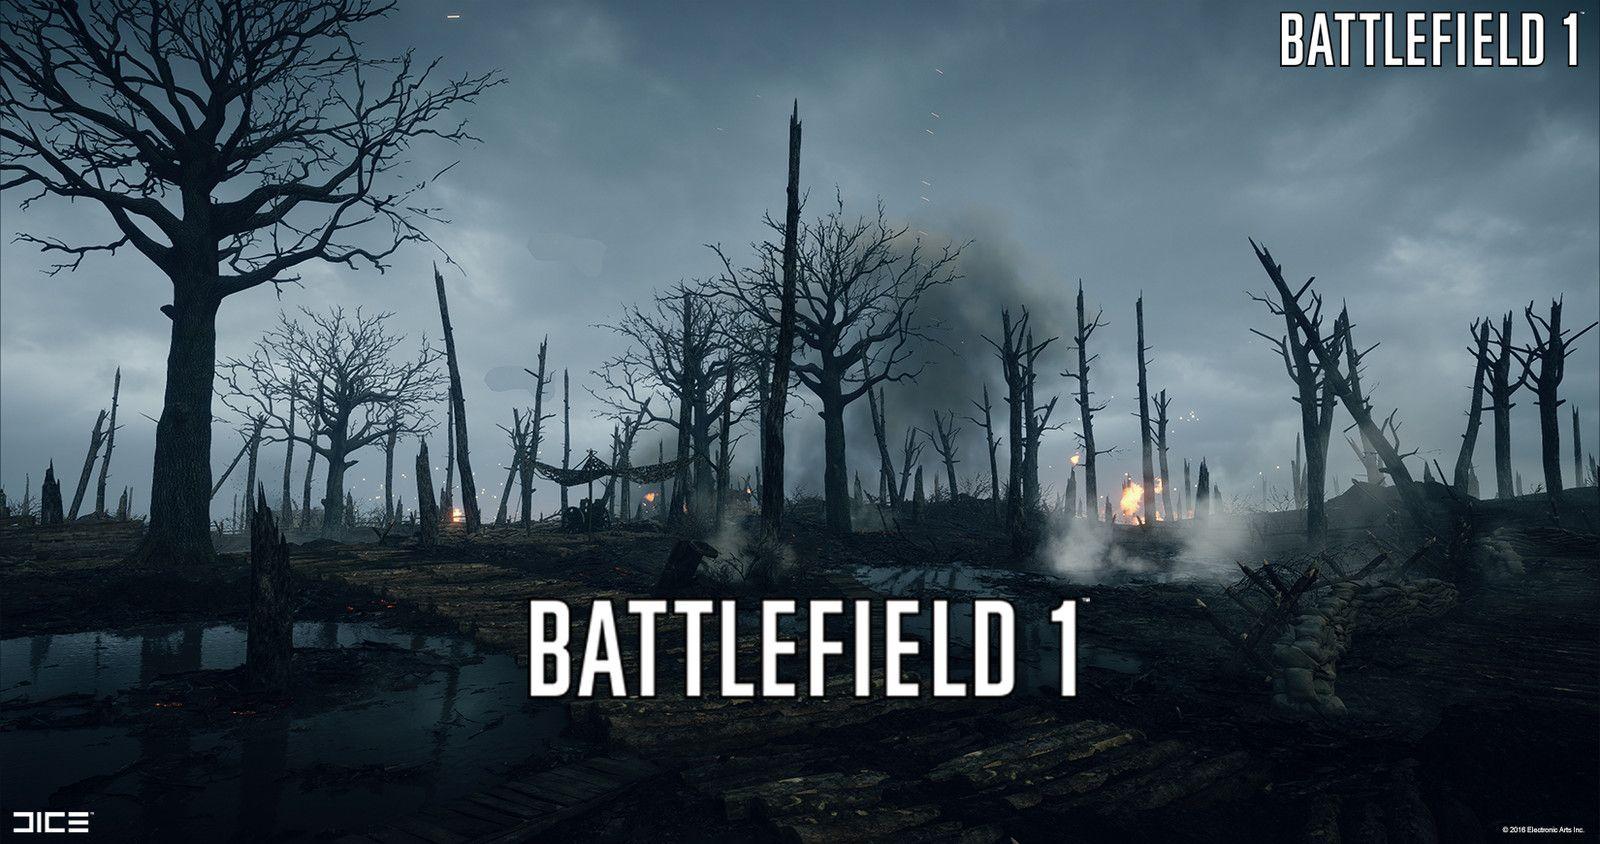 Battlefield 1 No Mans Land Simon Barle On Artstation At Https